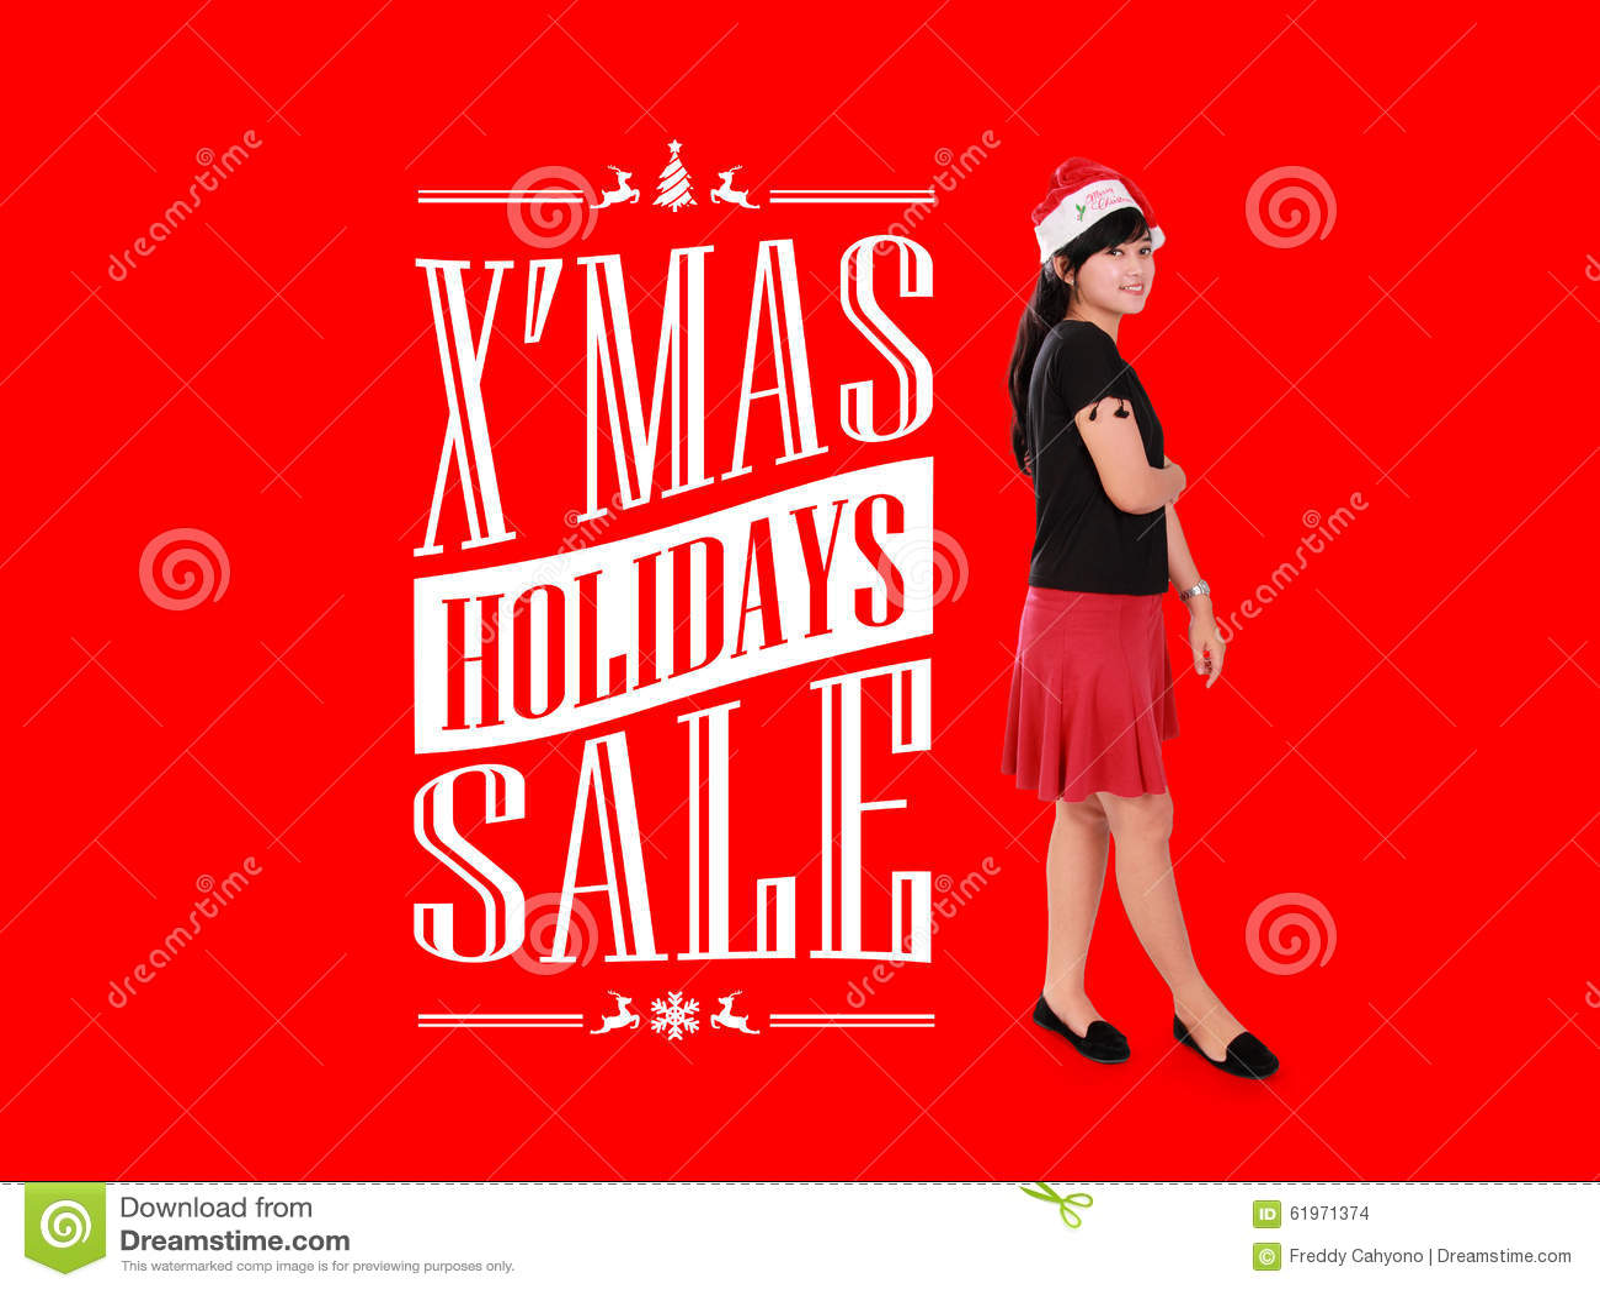 X Mas Holiday Sale Ad Illustration